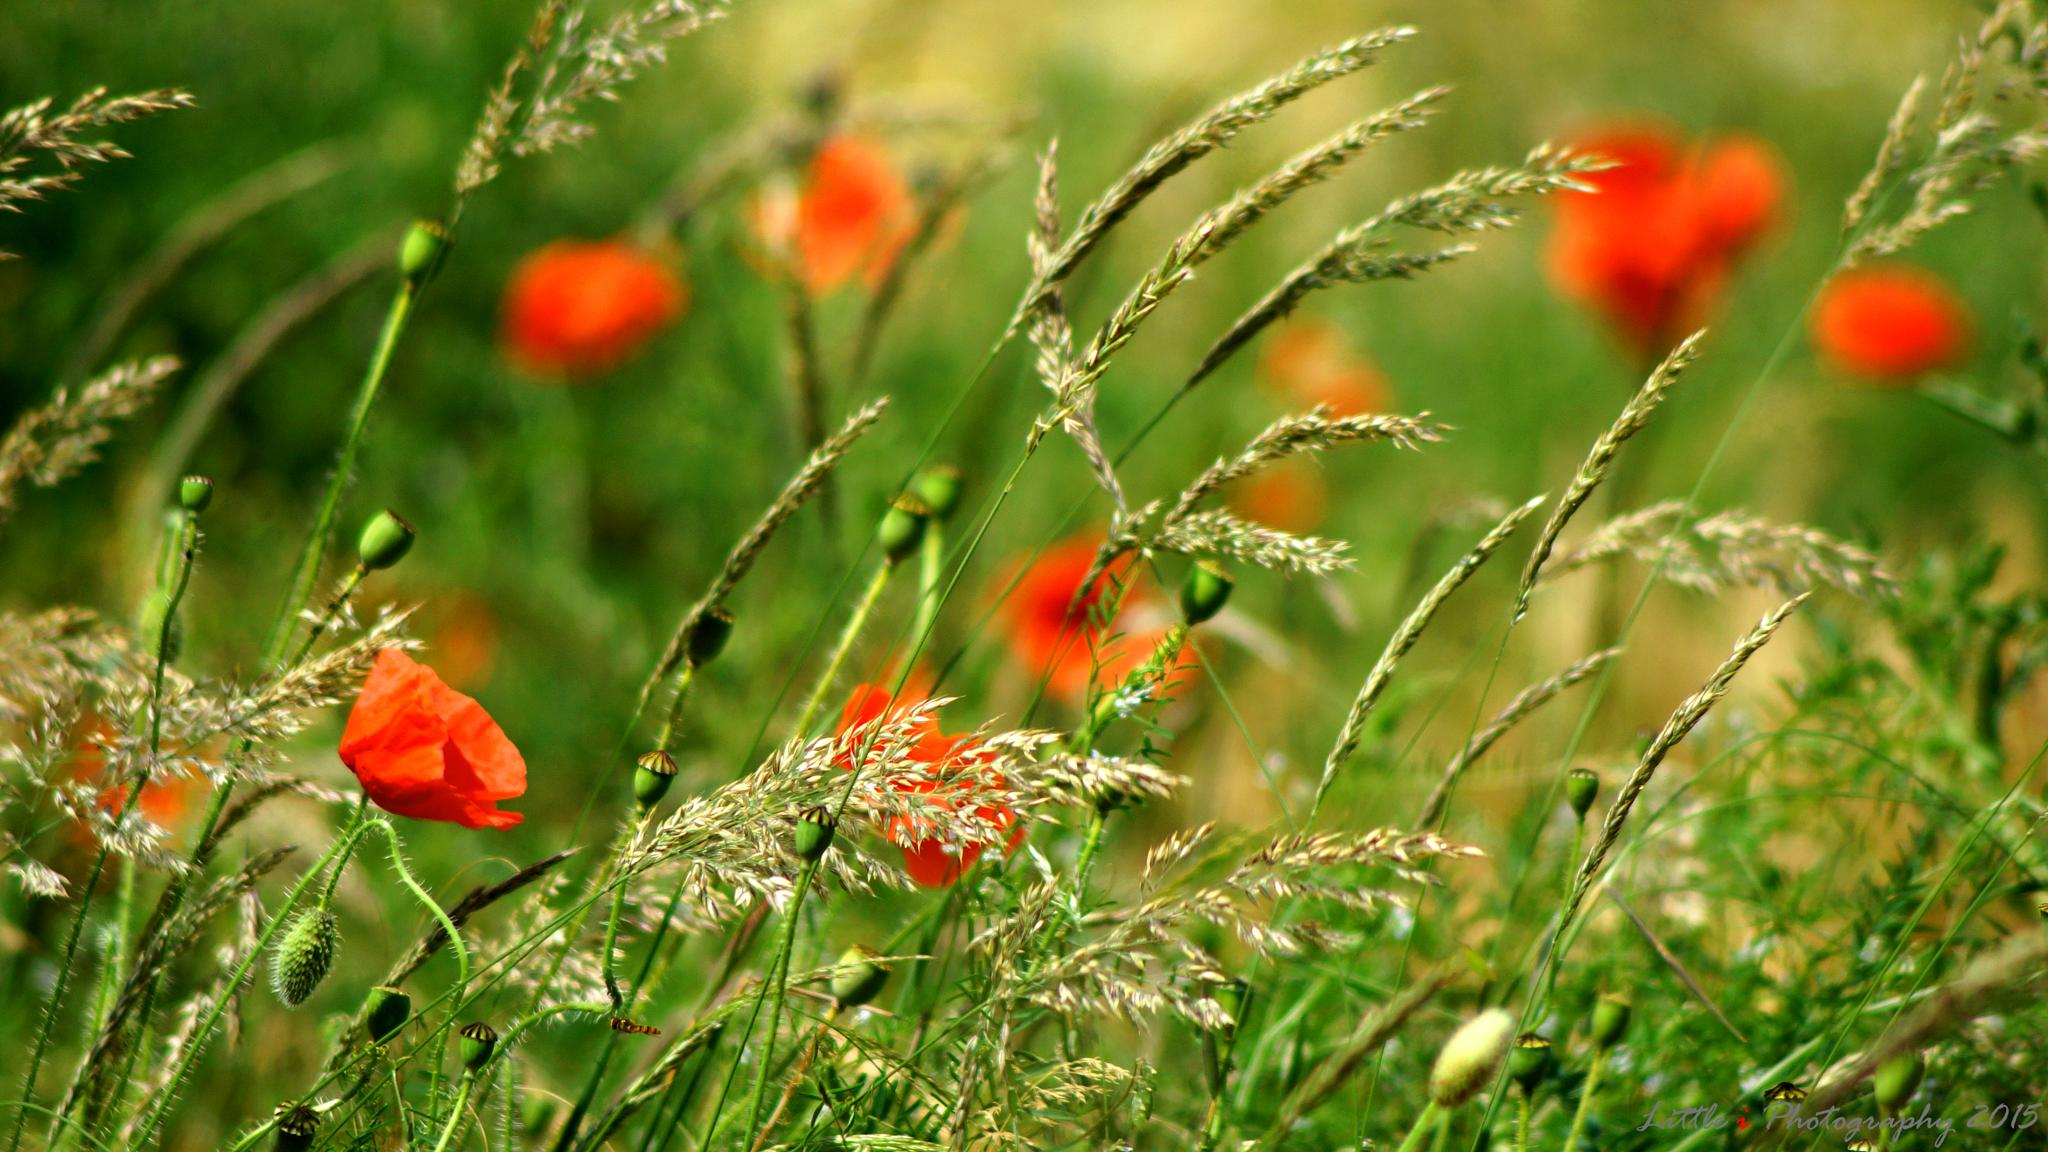 Poppy fields #1 by davecarter754